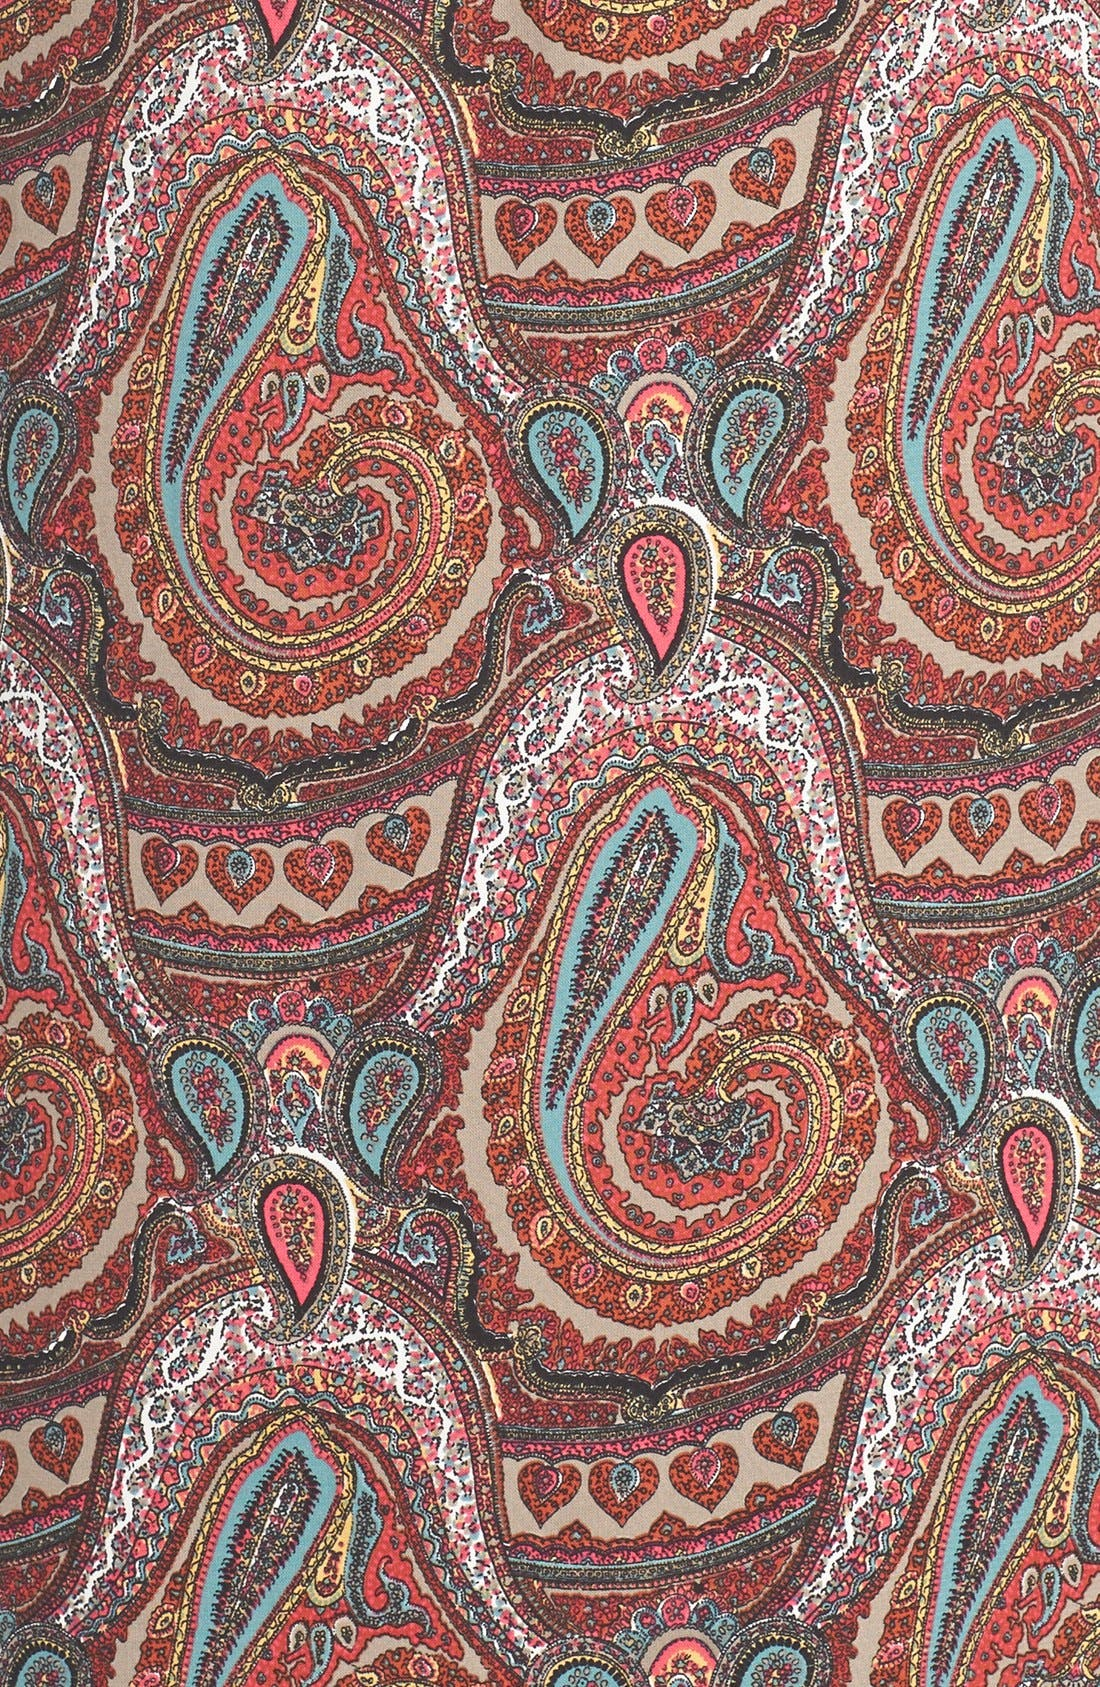 Paisley Print Maxi Dress,                             Alternate thumbnail 2, color,                             930